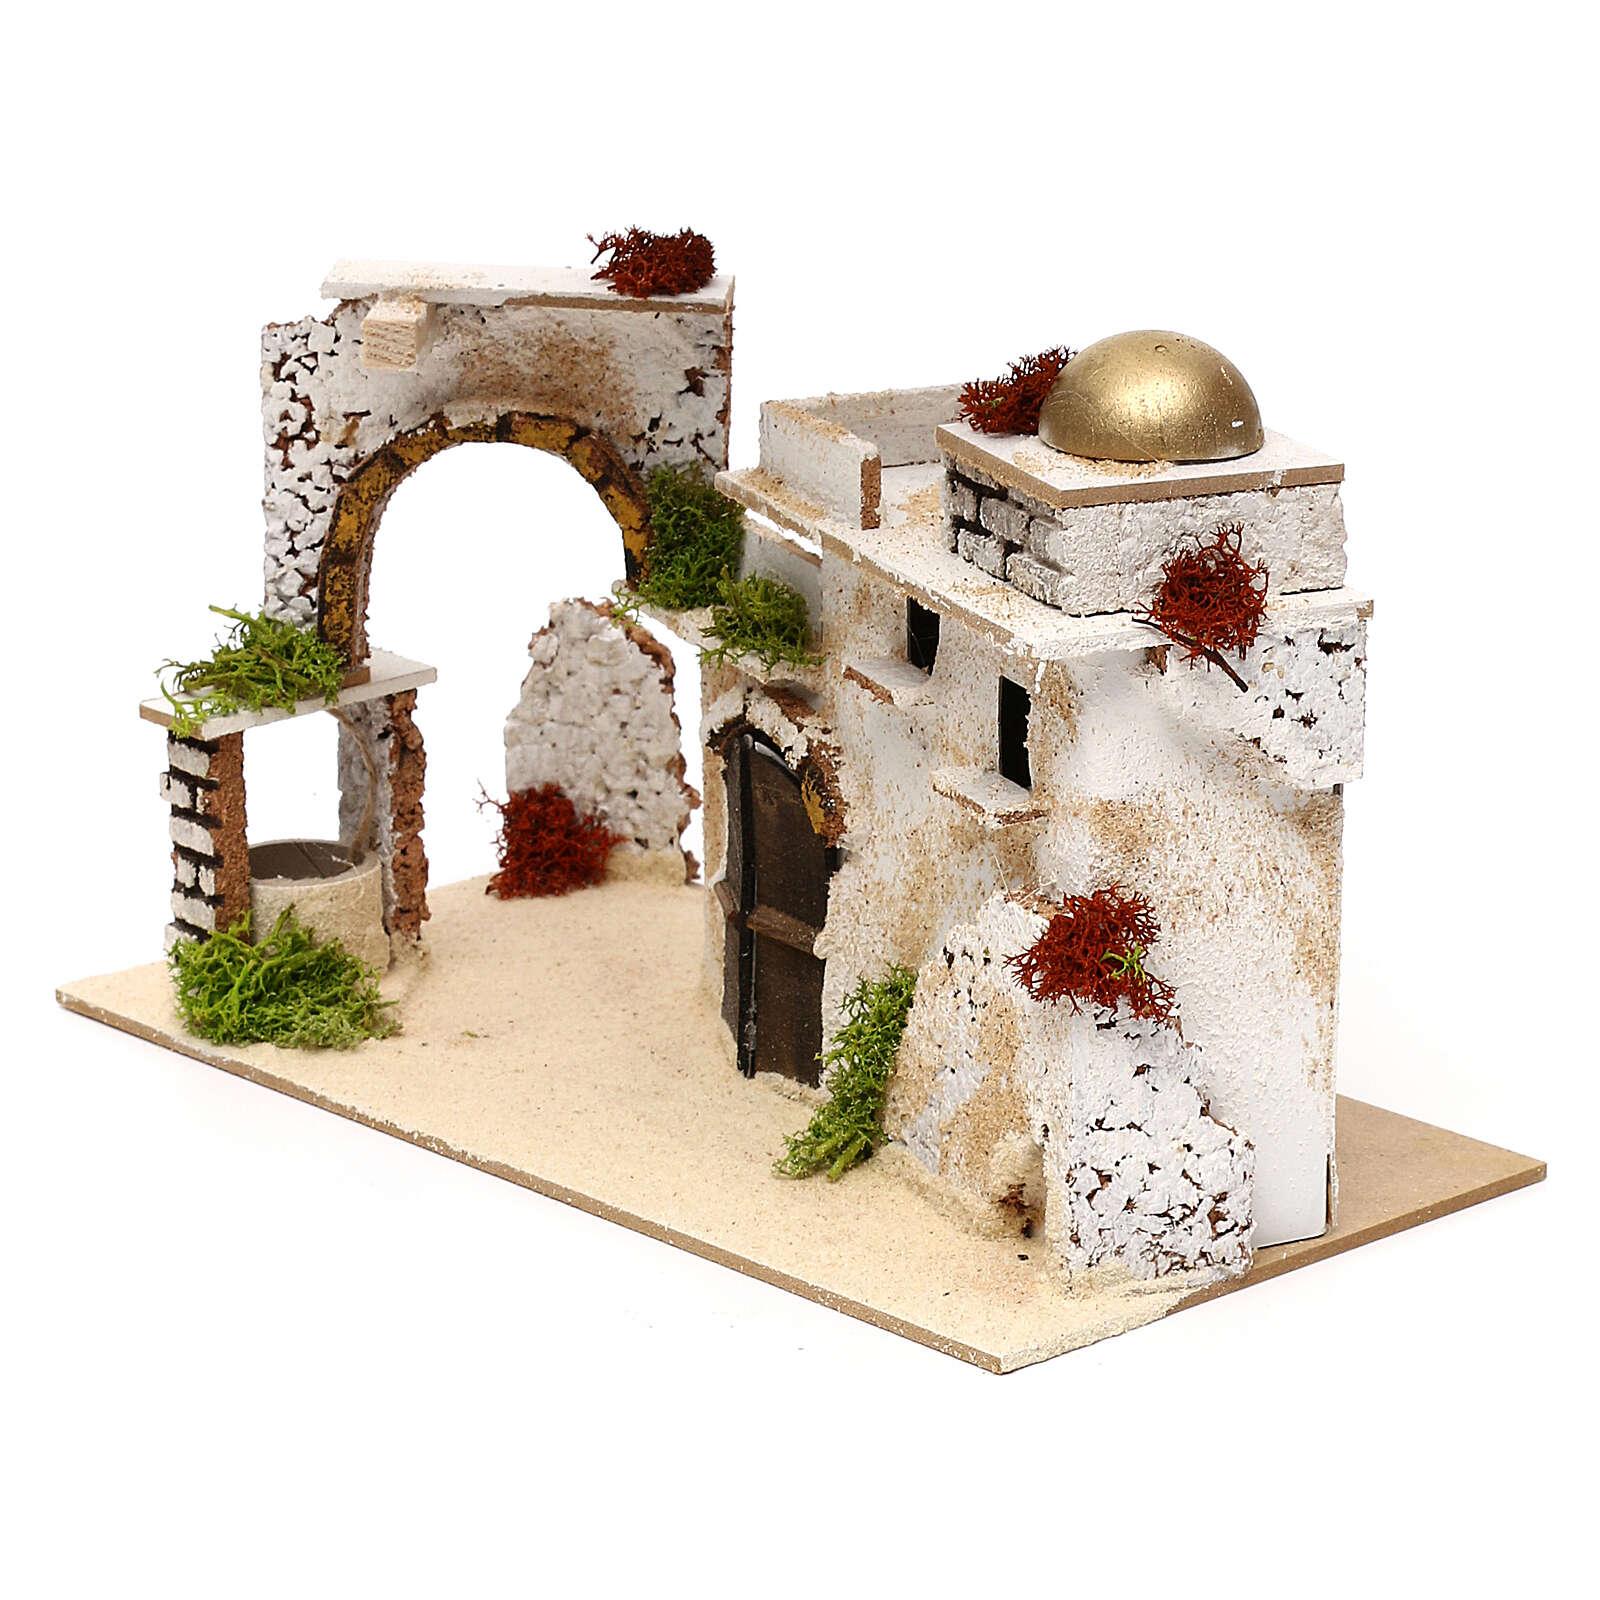 Arab house with arch, 20x30x15 cm 4